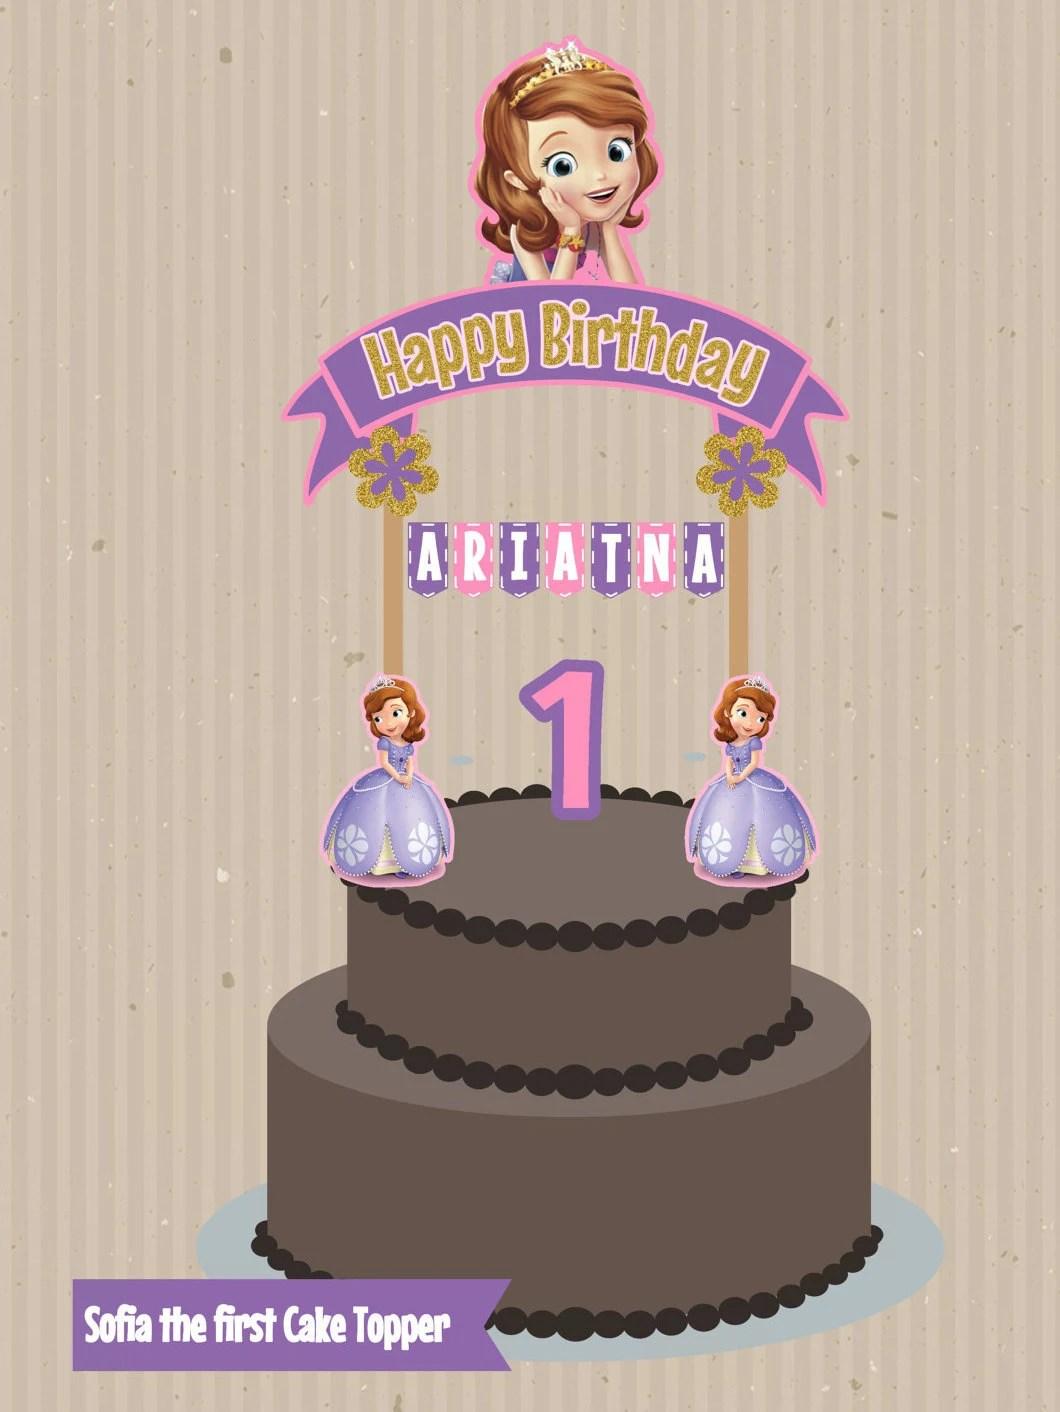 Sofia The First Cake Topper Banderin Para Torta Princess